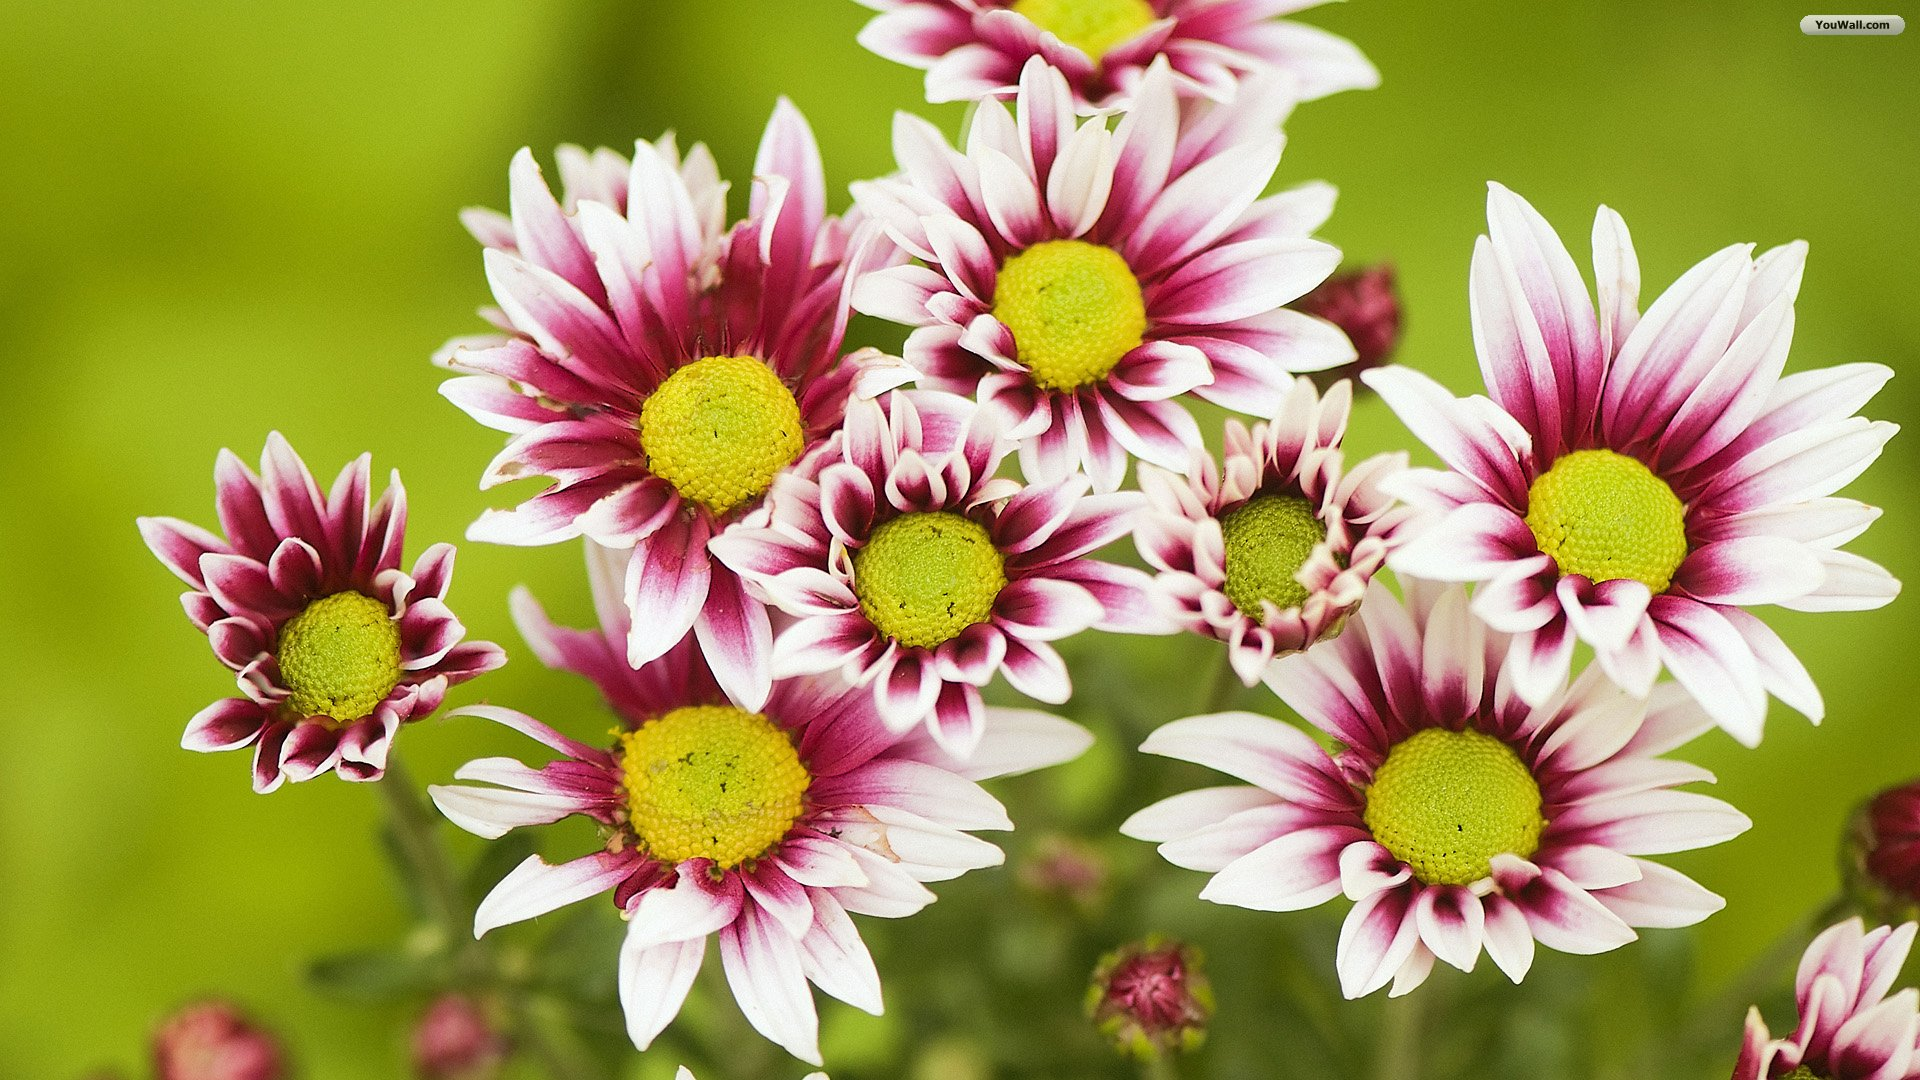 Beautiful Flowers Hd Widescreen 11 Thumb